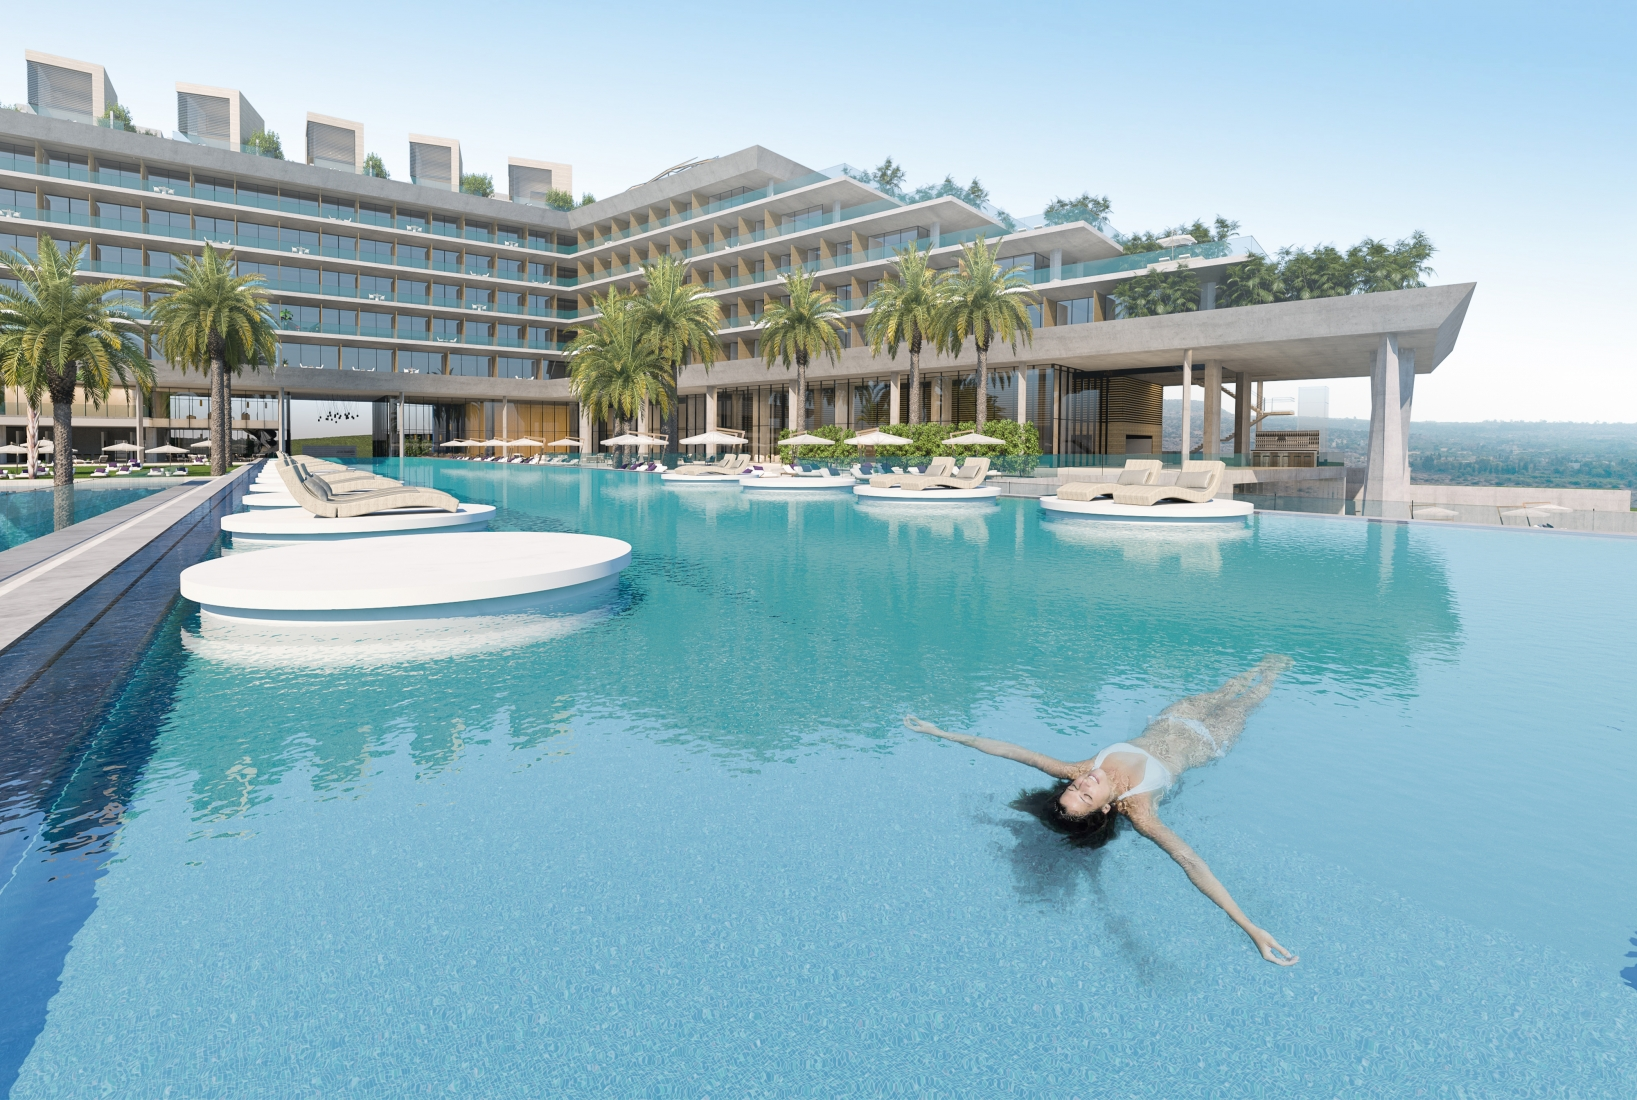 Eraclis Papachristou Architectural Office Formatio Hotel-Atlantica Ammos Bay